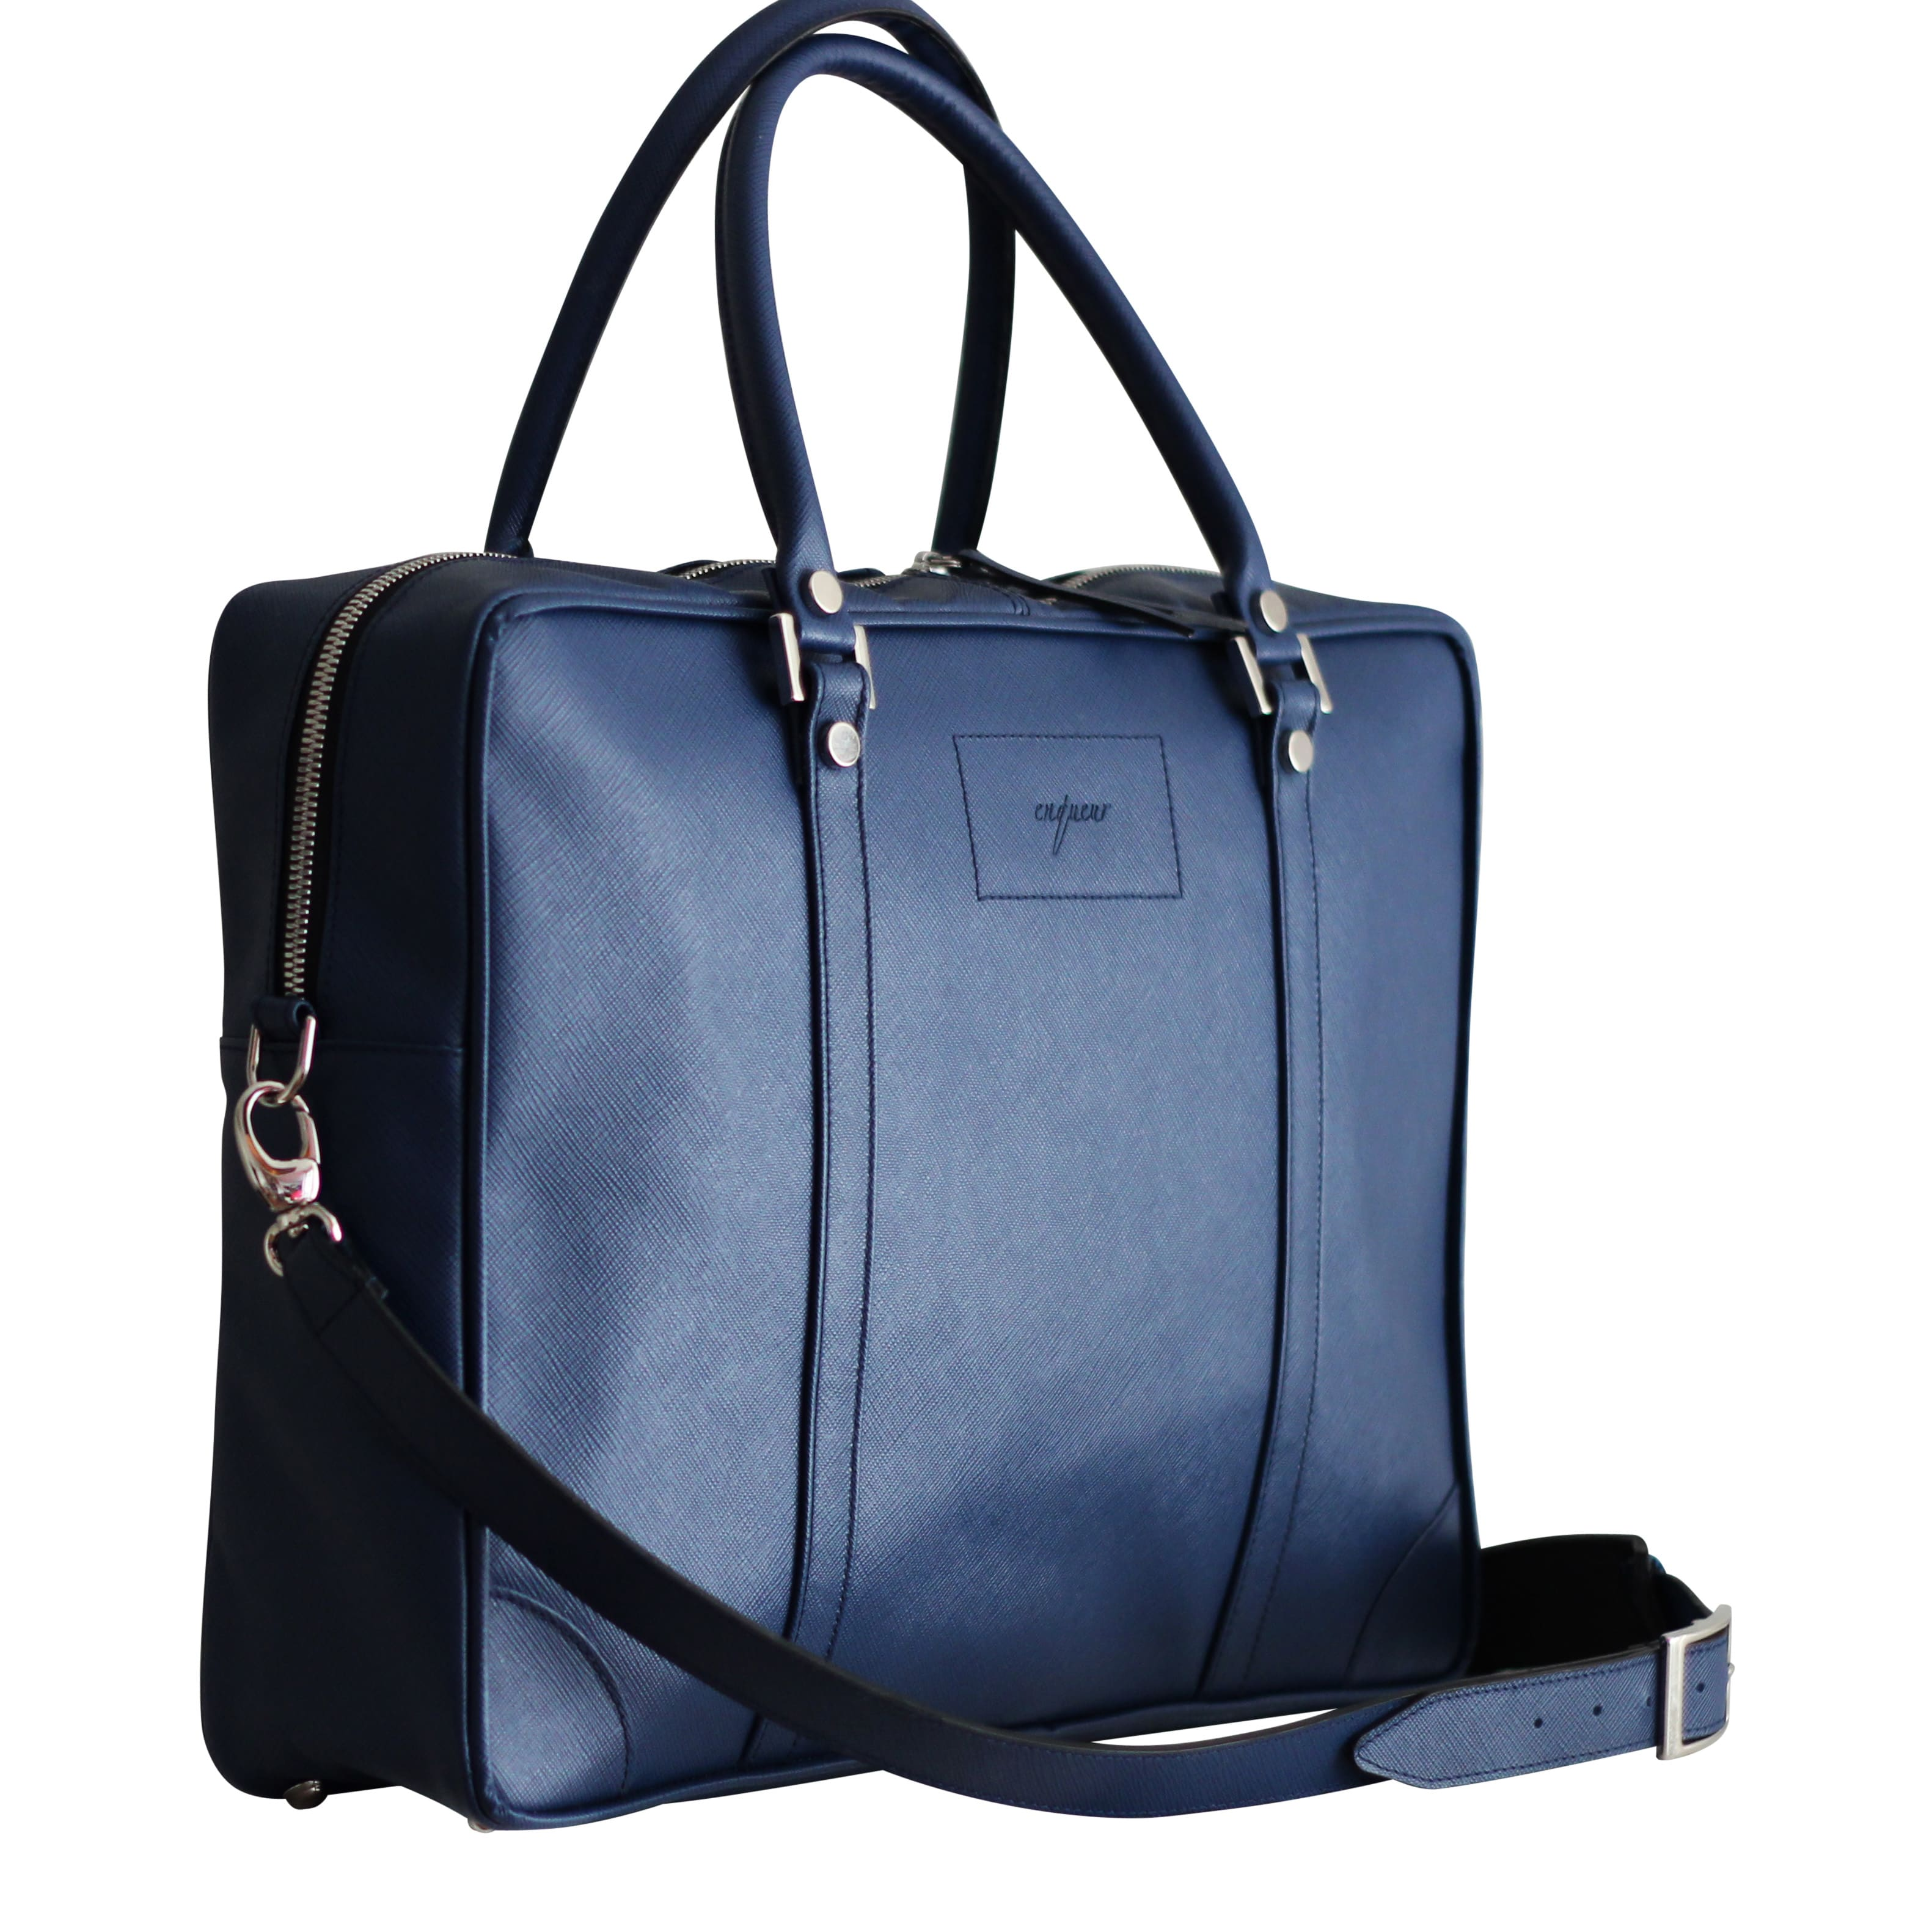 Paisley_Saffiano_leather_blue